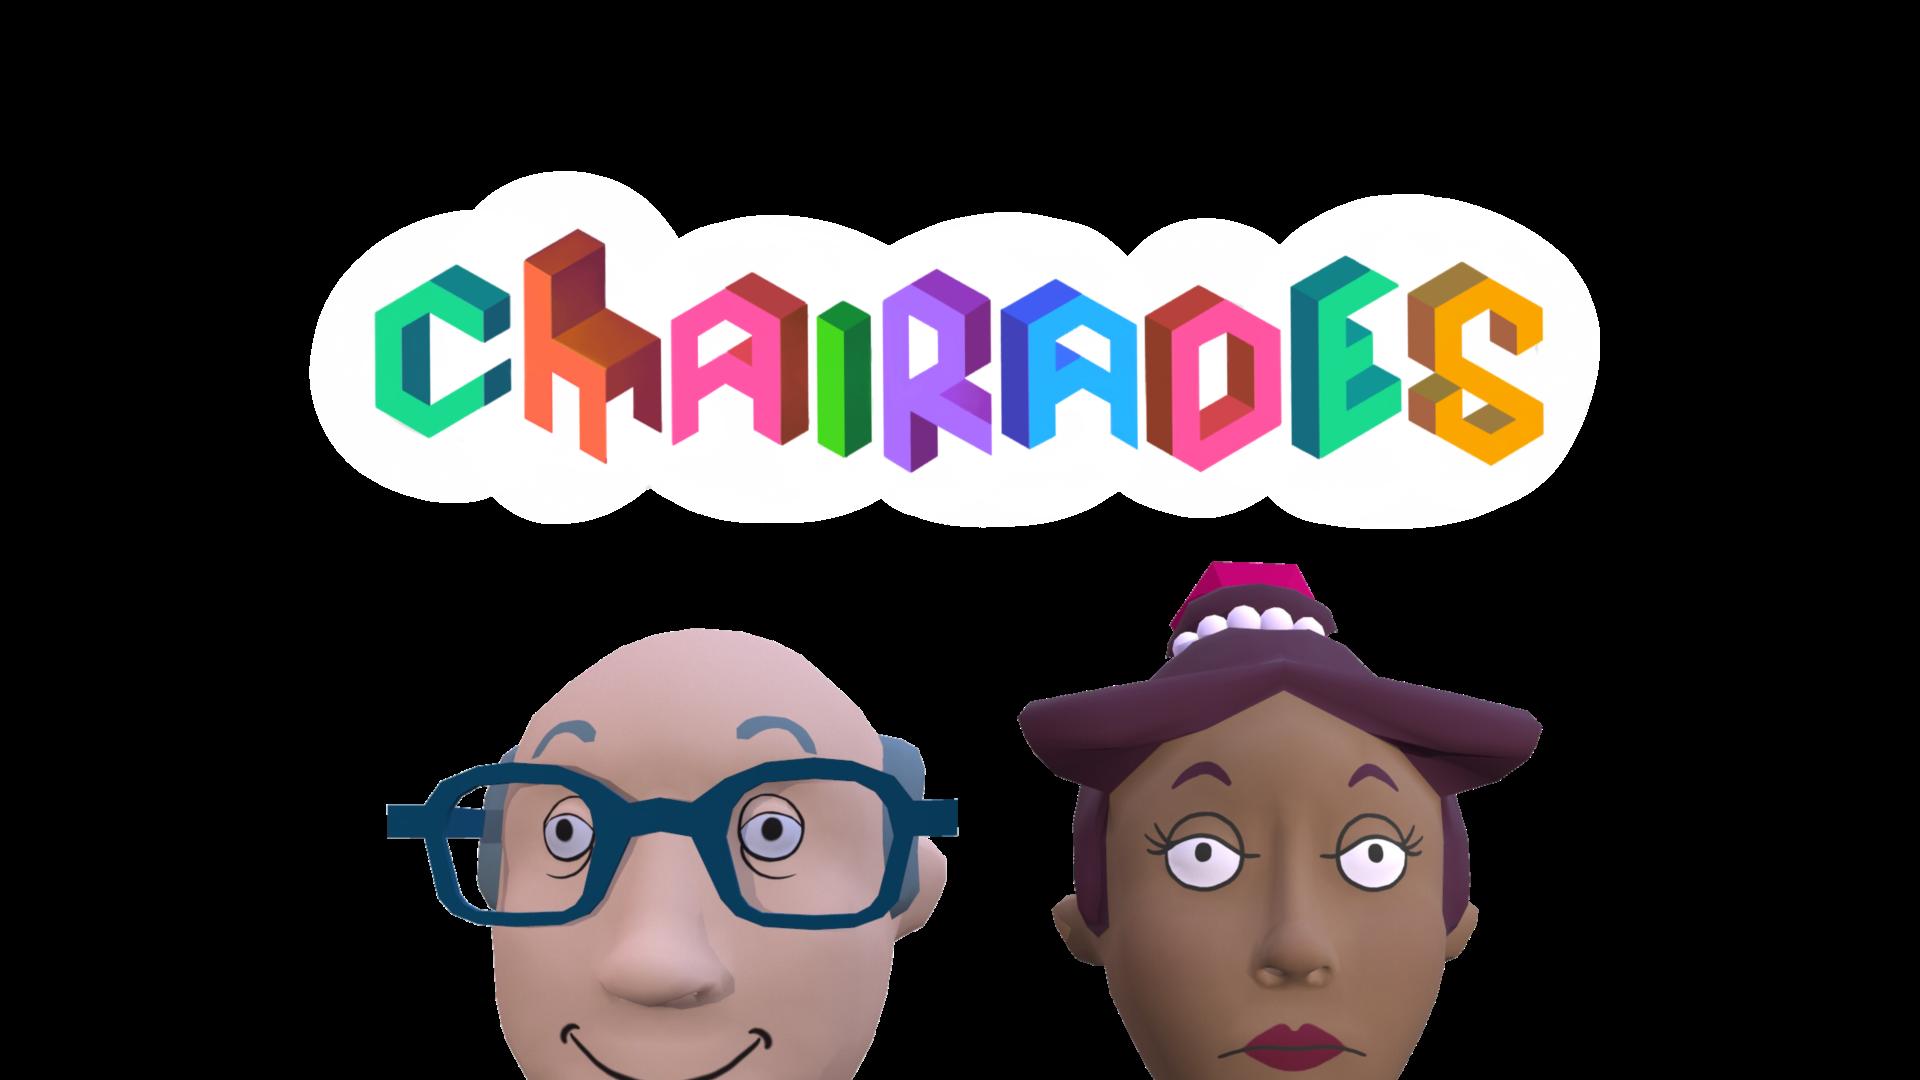 Chairades